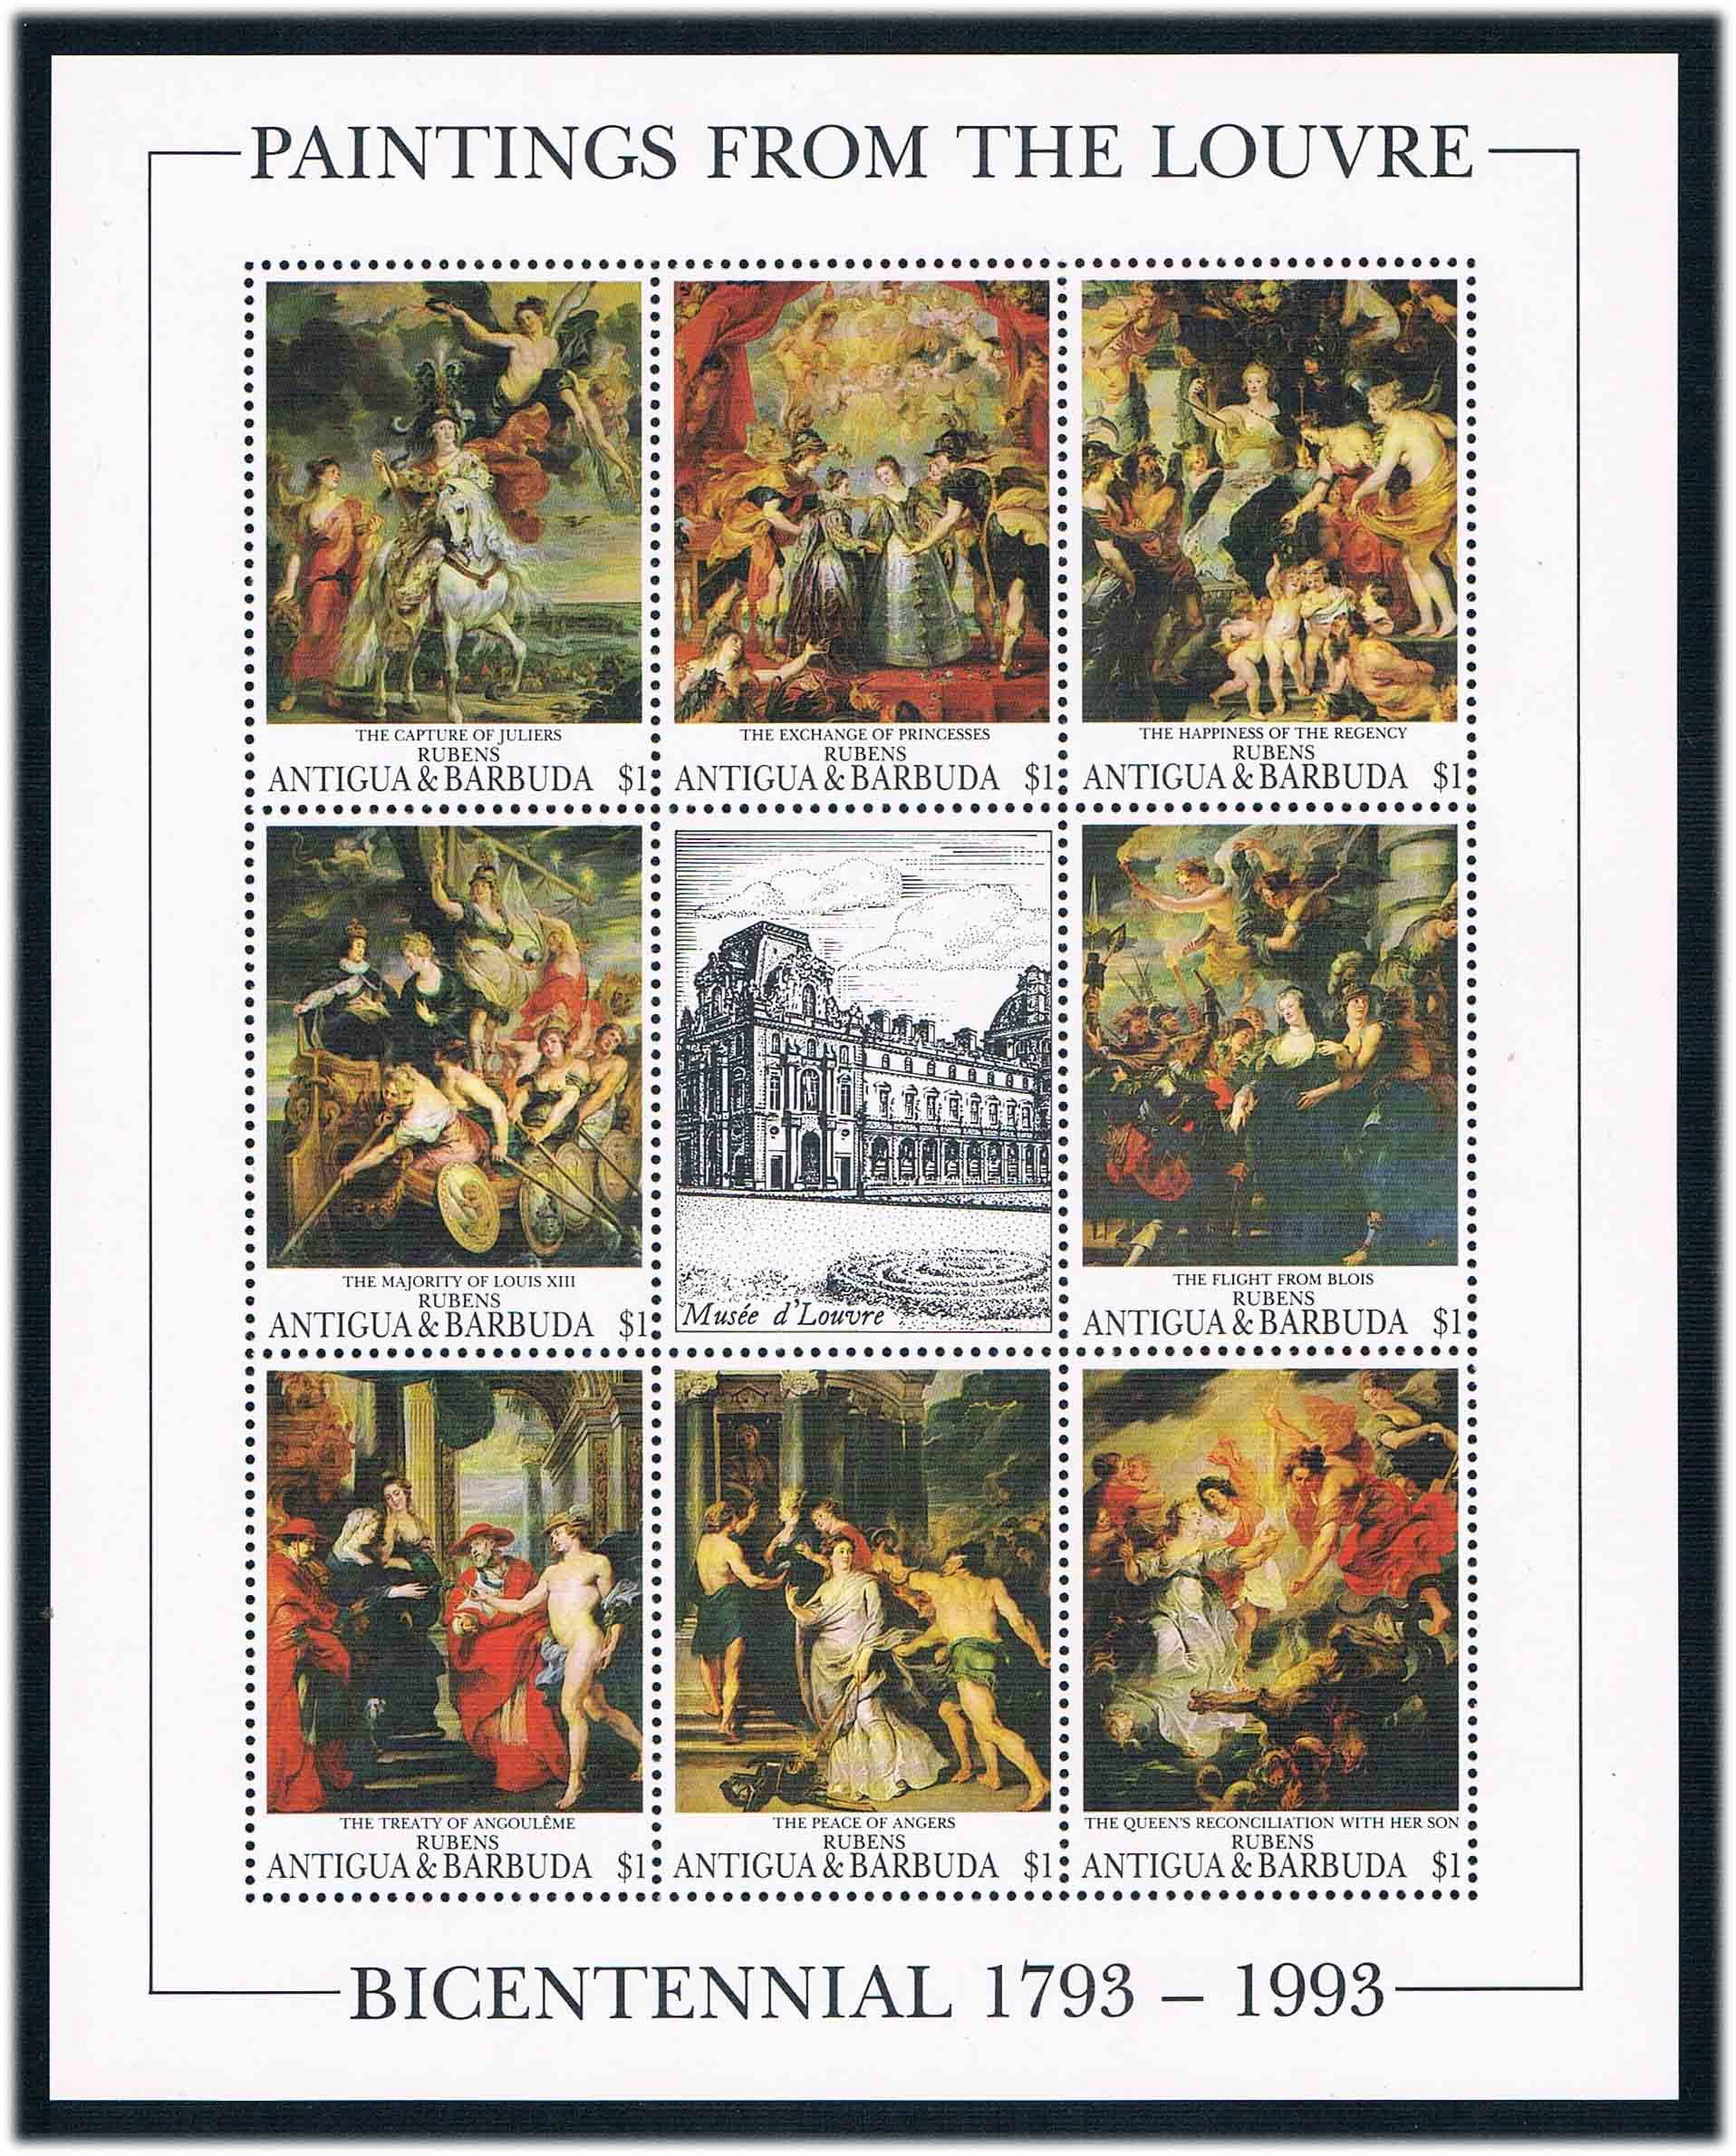 DA0635 Antigua Barbuda 1993 Le Louvre Museum 1MS new 0731 paintings of Lubensi's painting movado museum classic 0606503